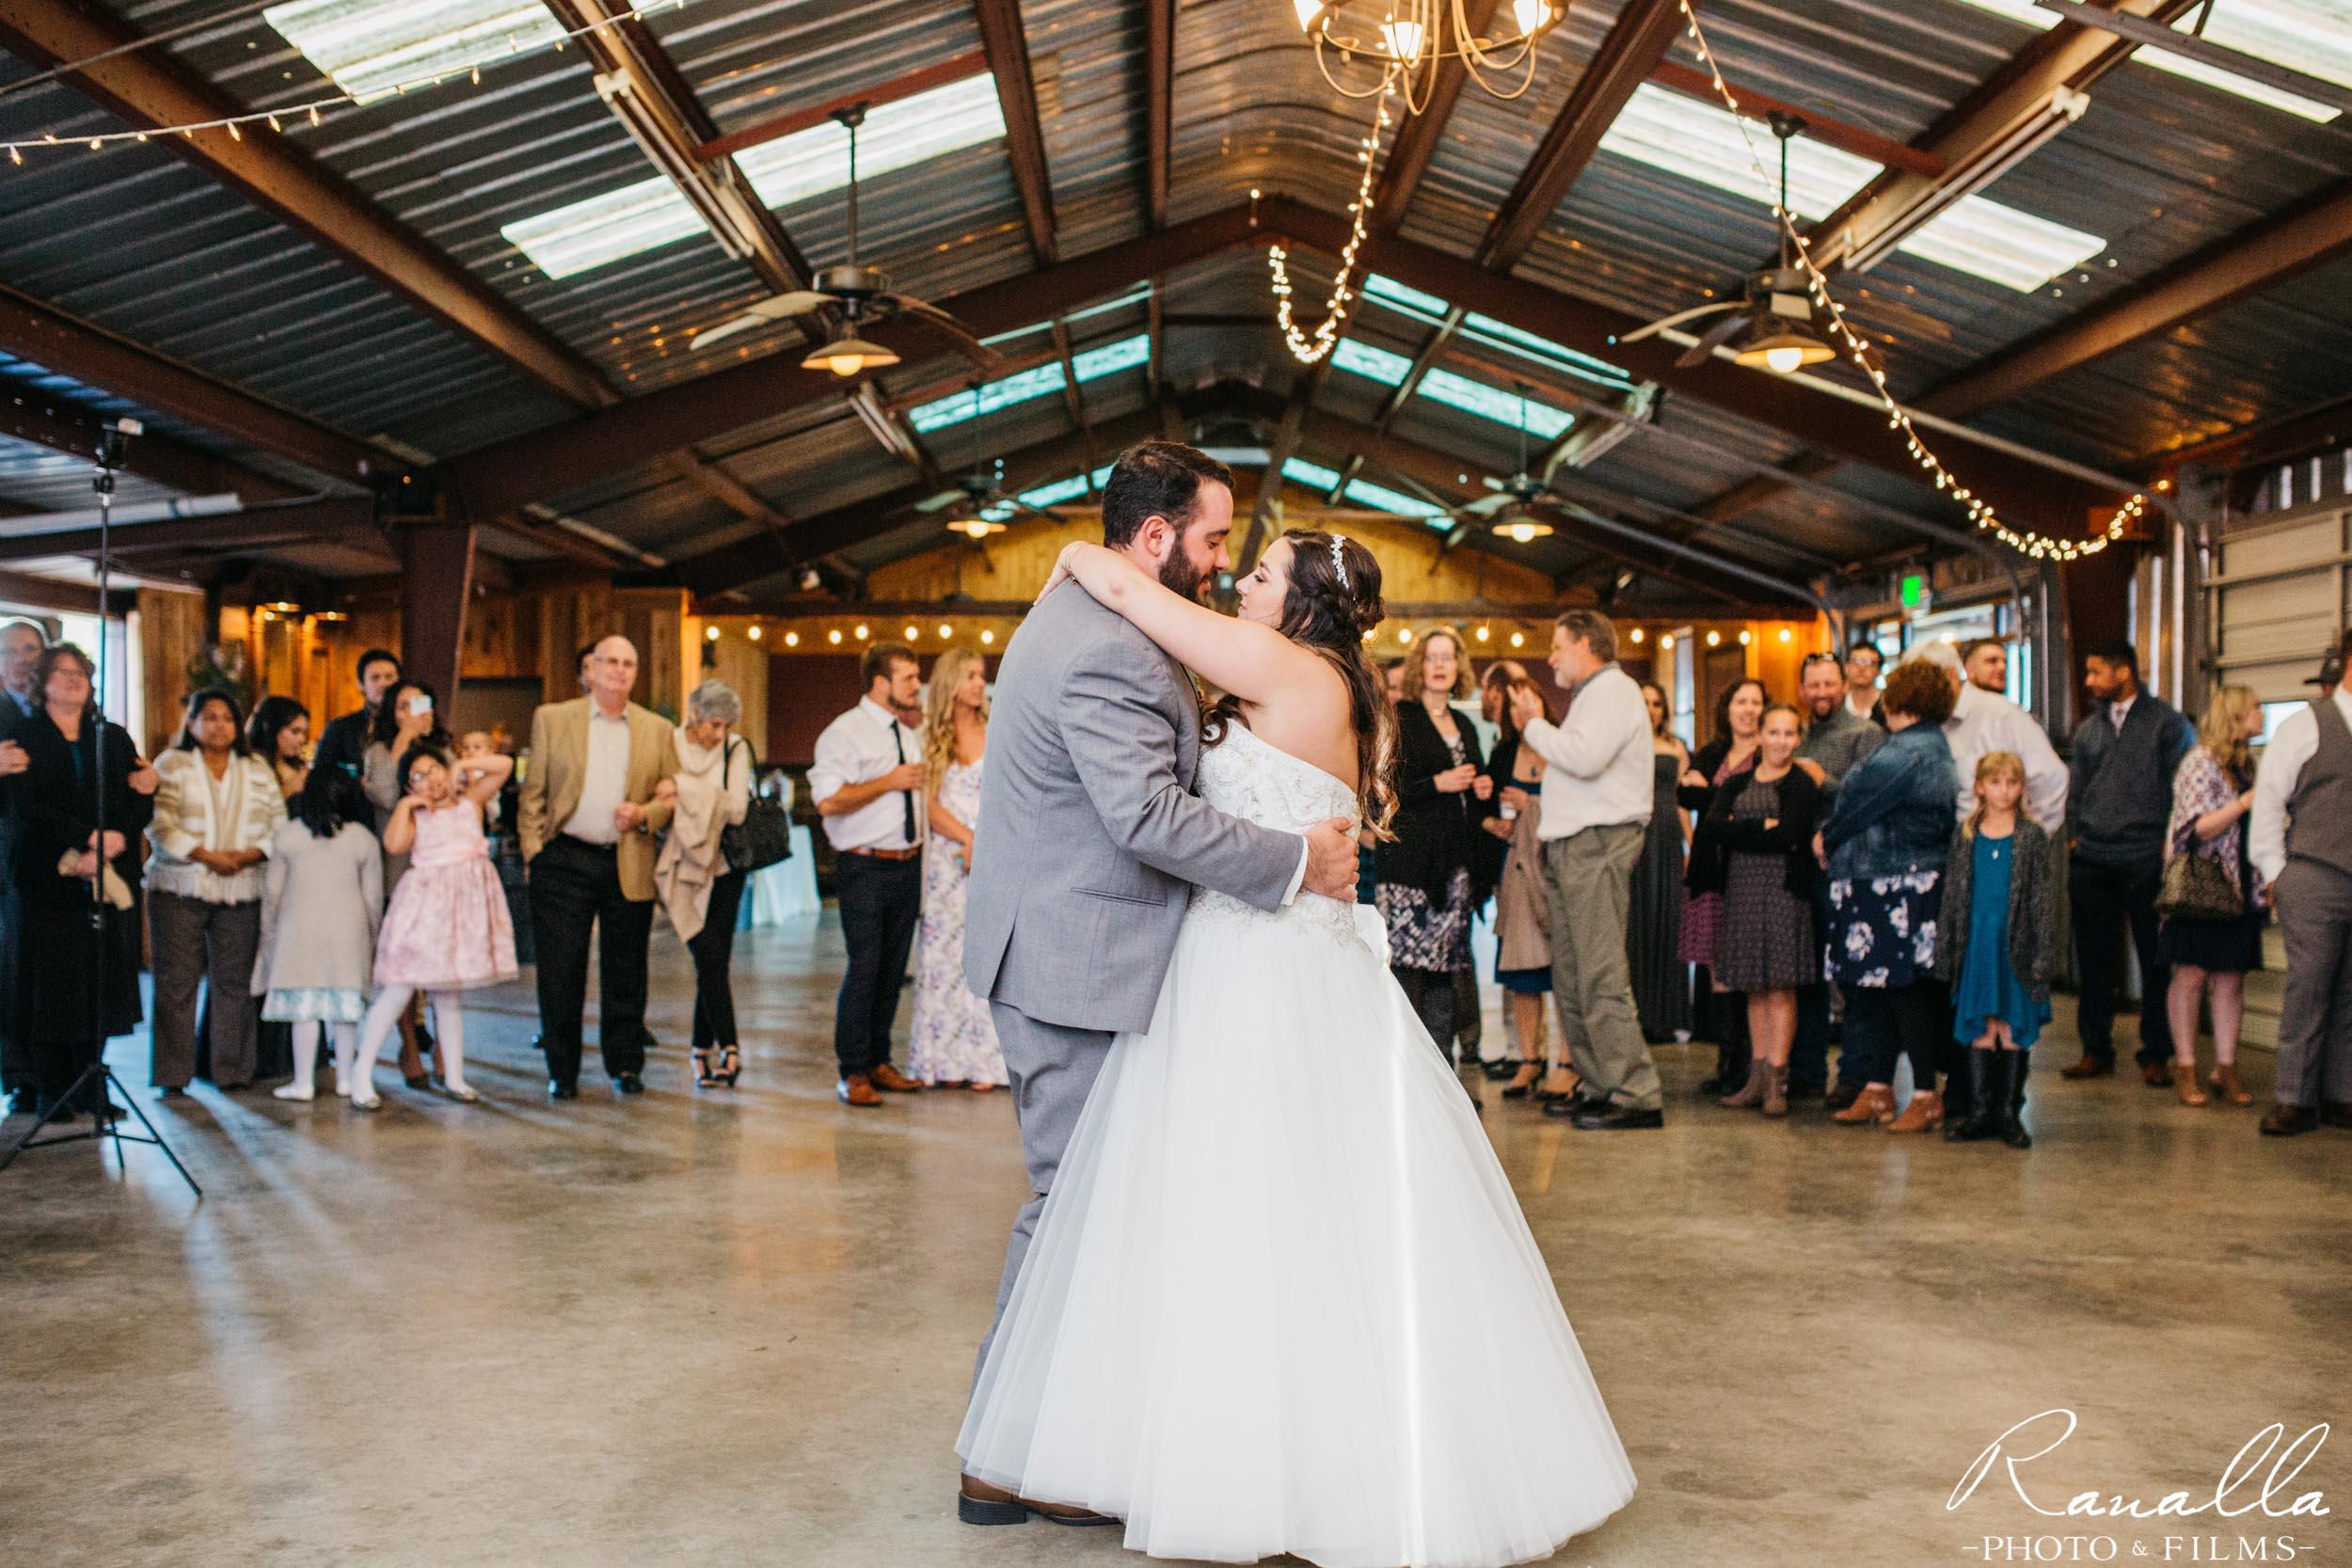 Chico Wedding Photography- Bride & Groom First Dance- Elite Sound- Patrick Ranch Wedding Photos- Ranalla Photo & Films